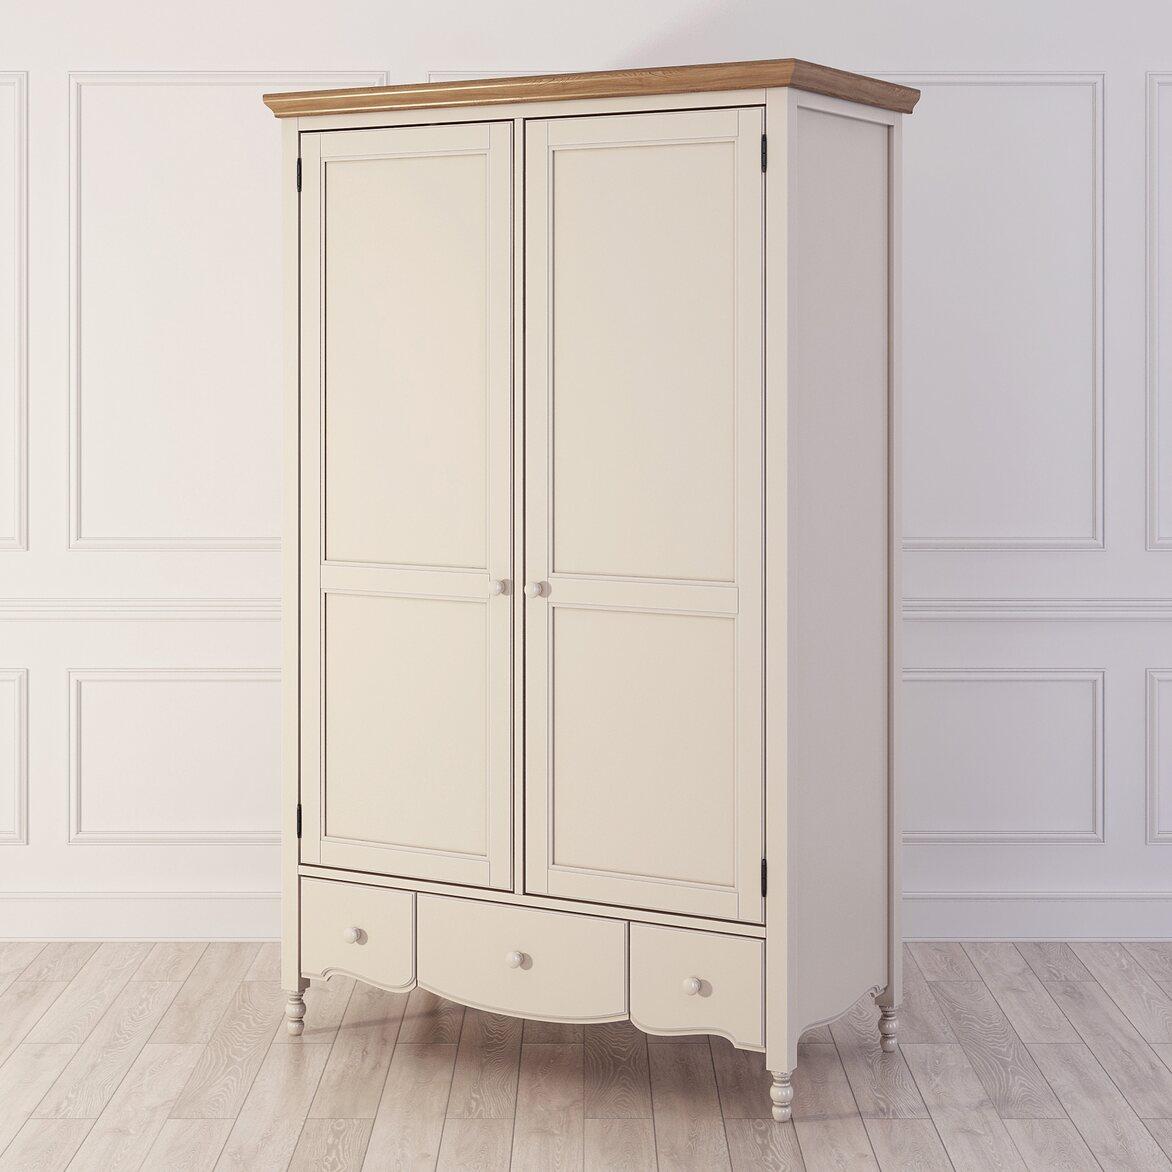 Шкаф двухстворчатый Leblanc, бежевый   Платяные шкафы Kingsby